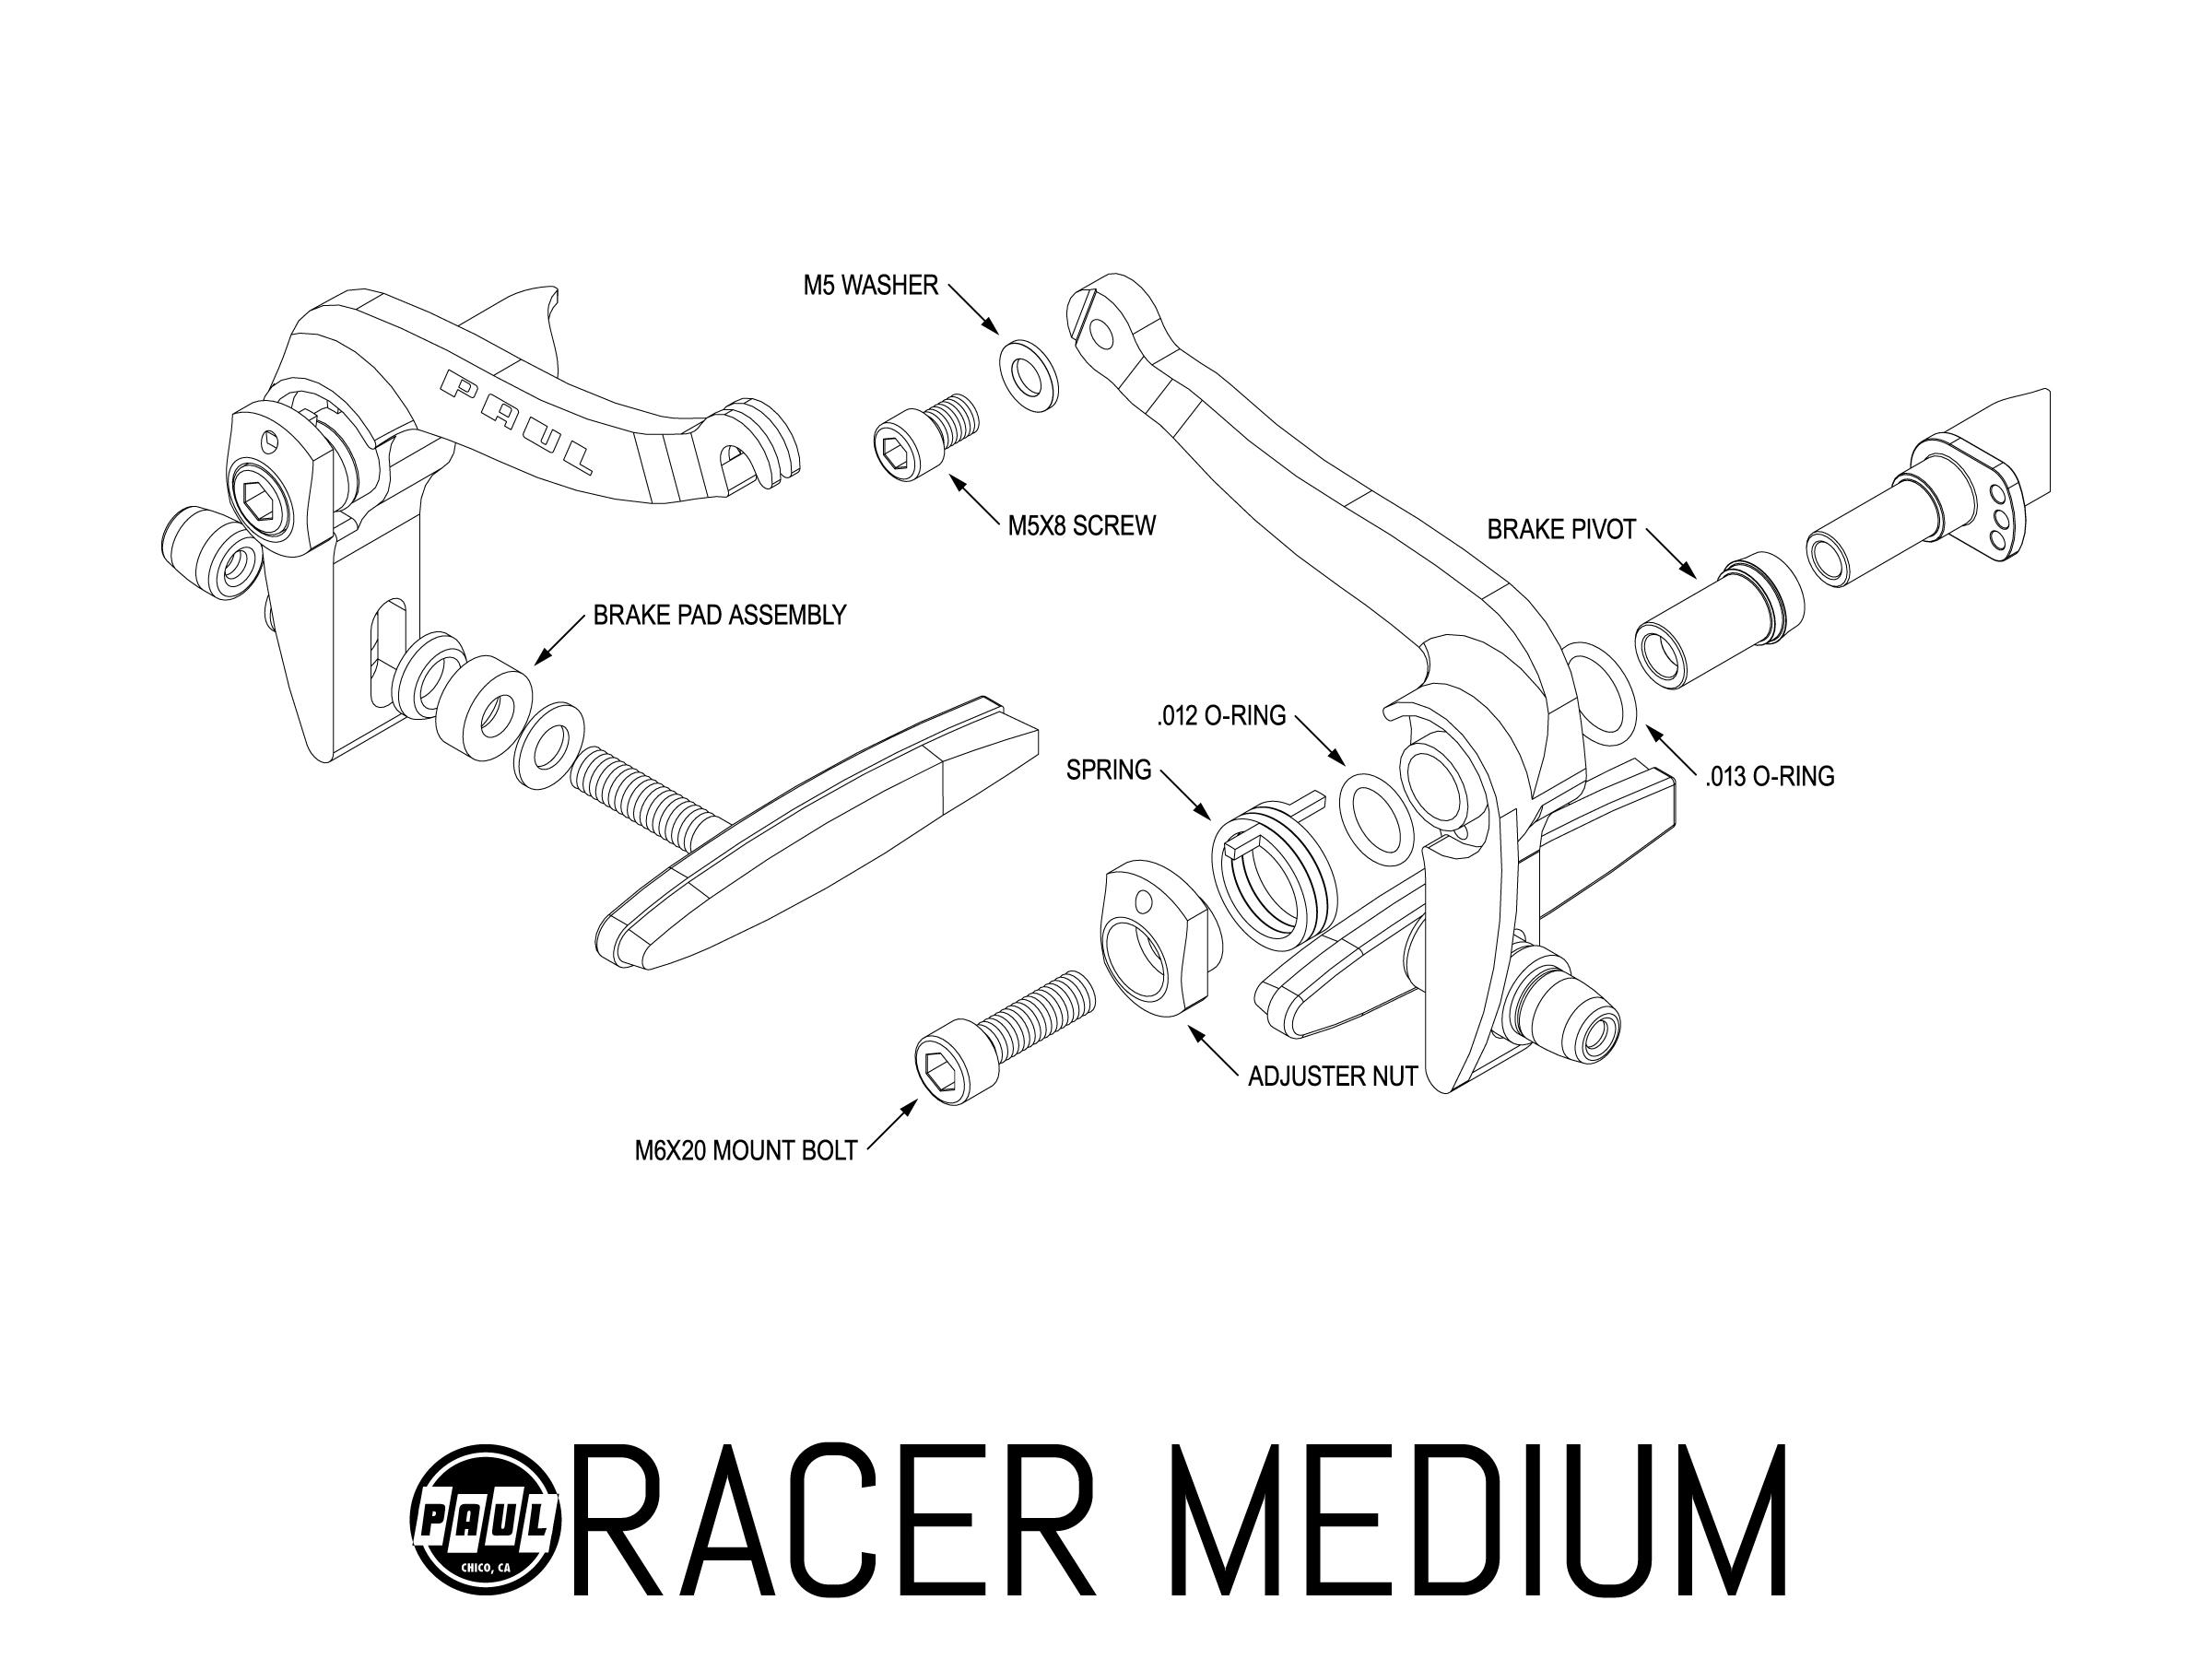 Racer Medium Paul Component Engineering